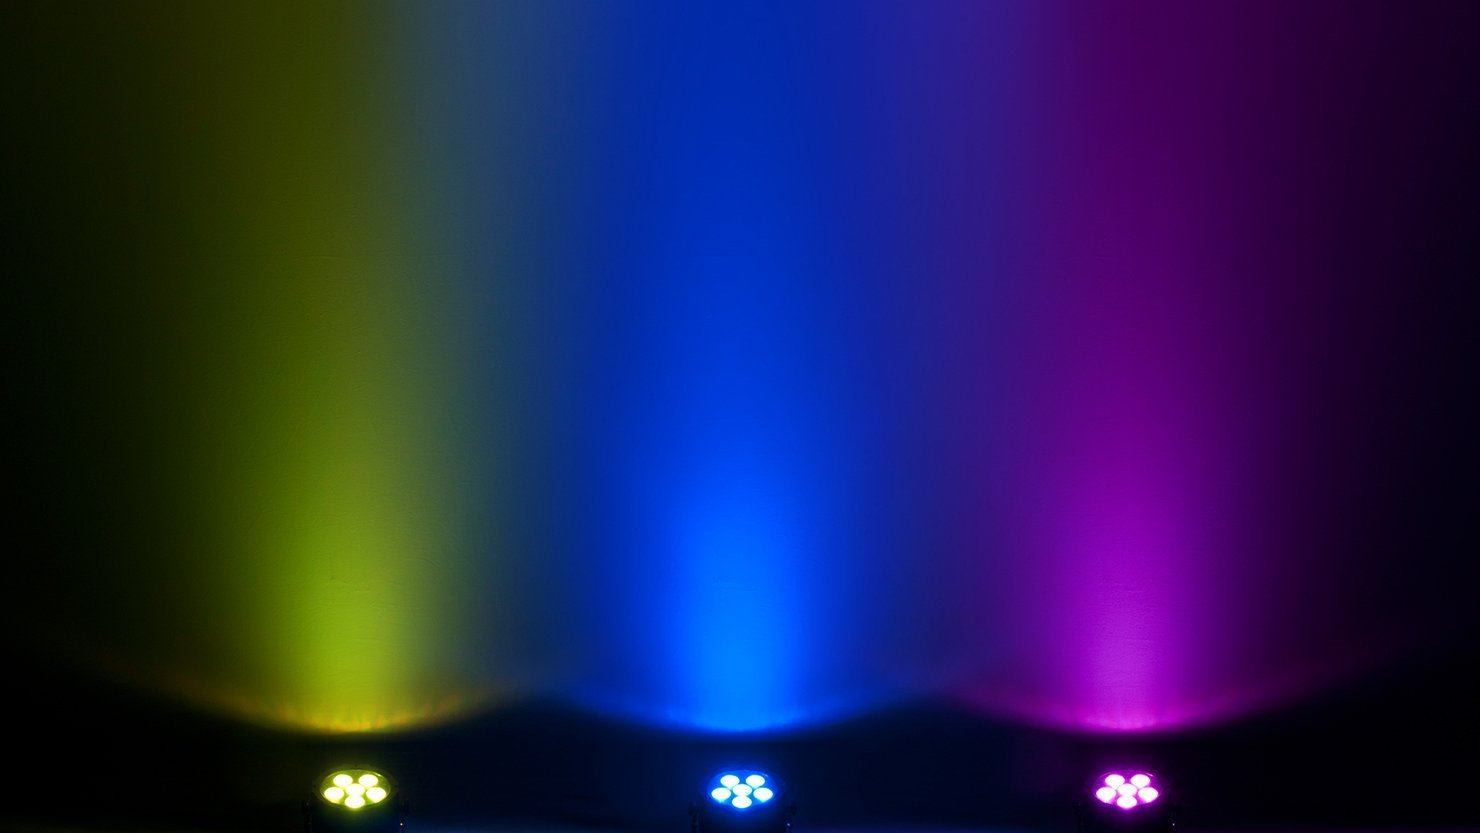 CHAUVET DJ EZpar T6 USB Battery-Powered Tri-Color LED Wash Light | LED Lighting by CHAUVET DJ